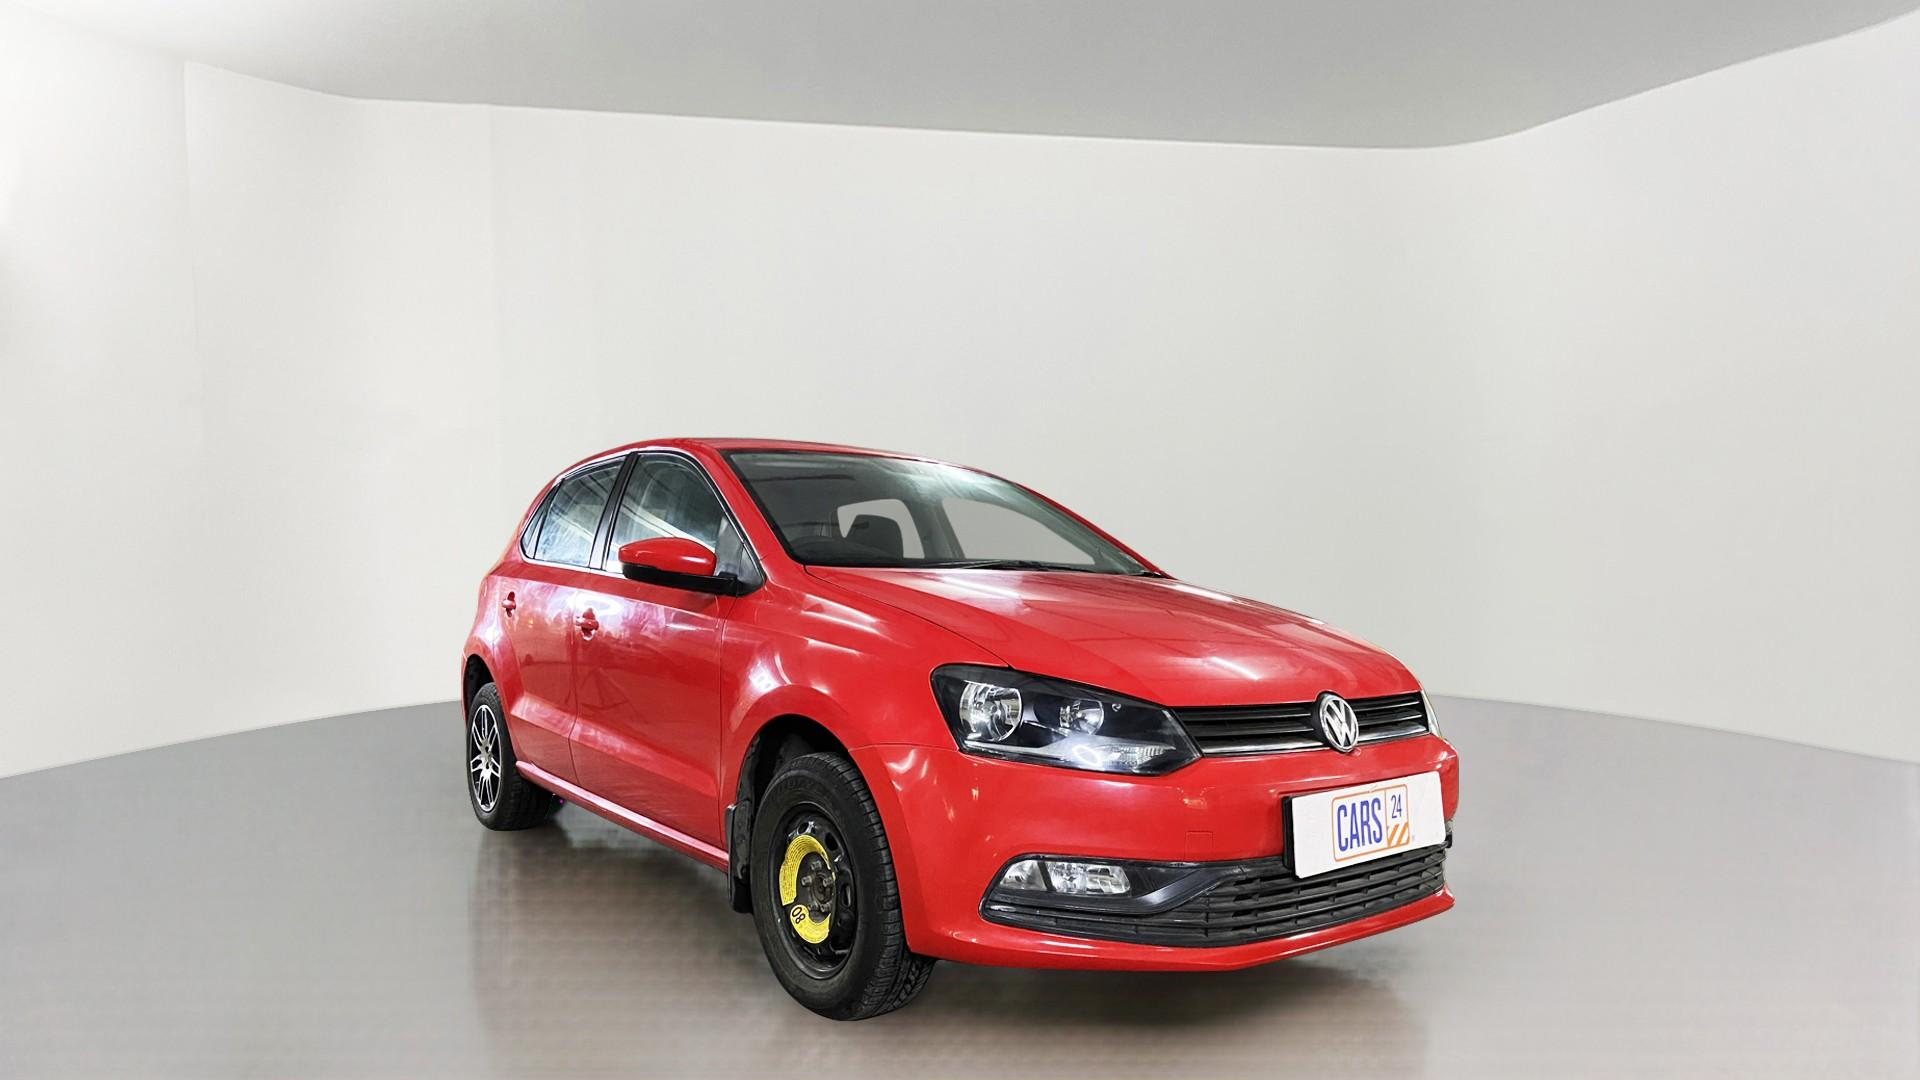 2018 Volkswagen Polo Trendline 1.0 L Petrol